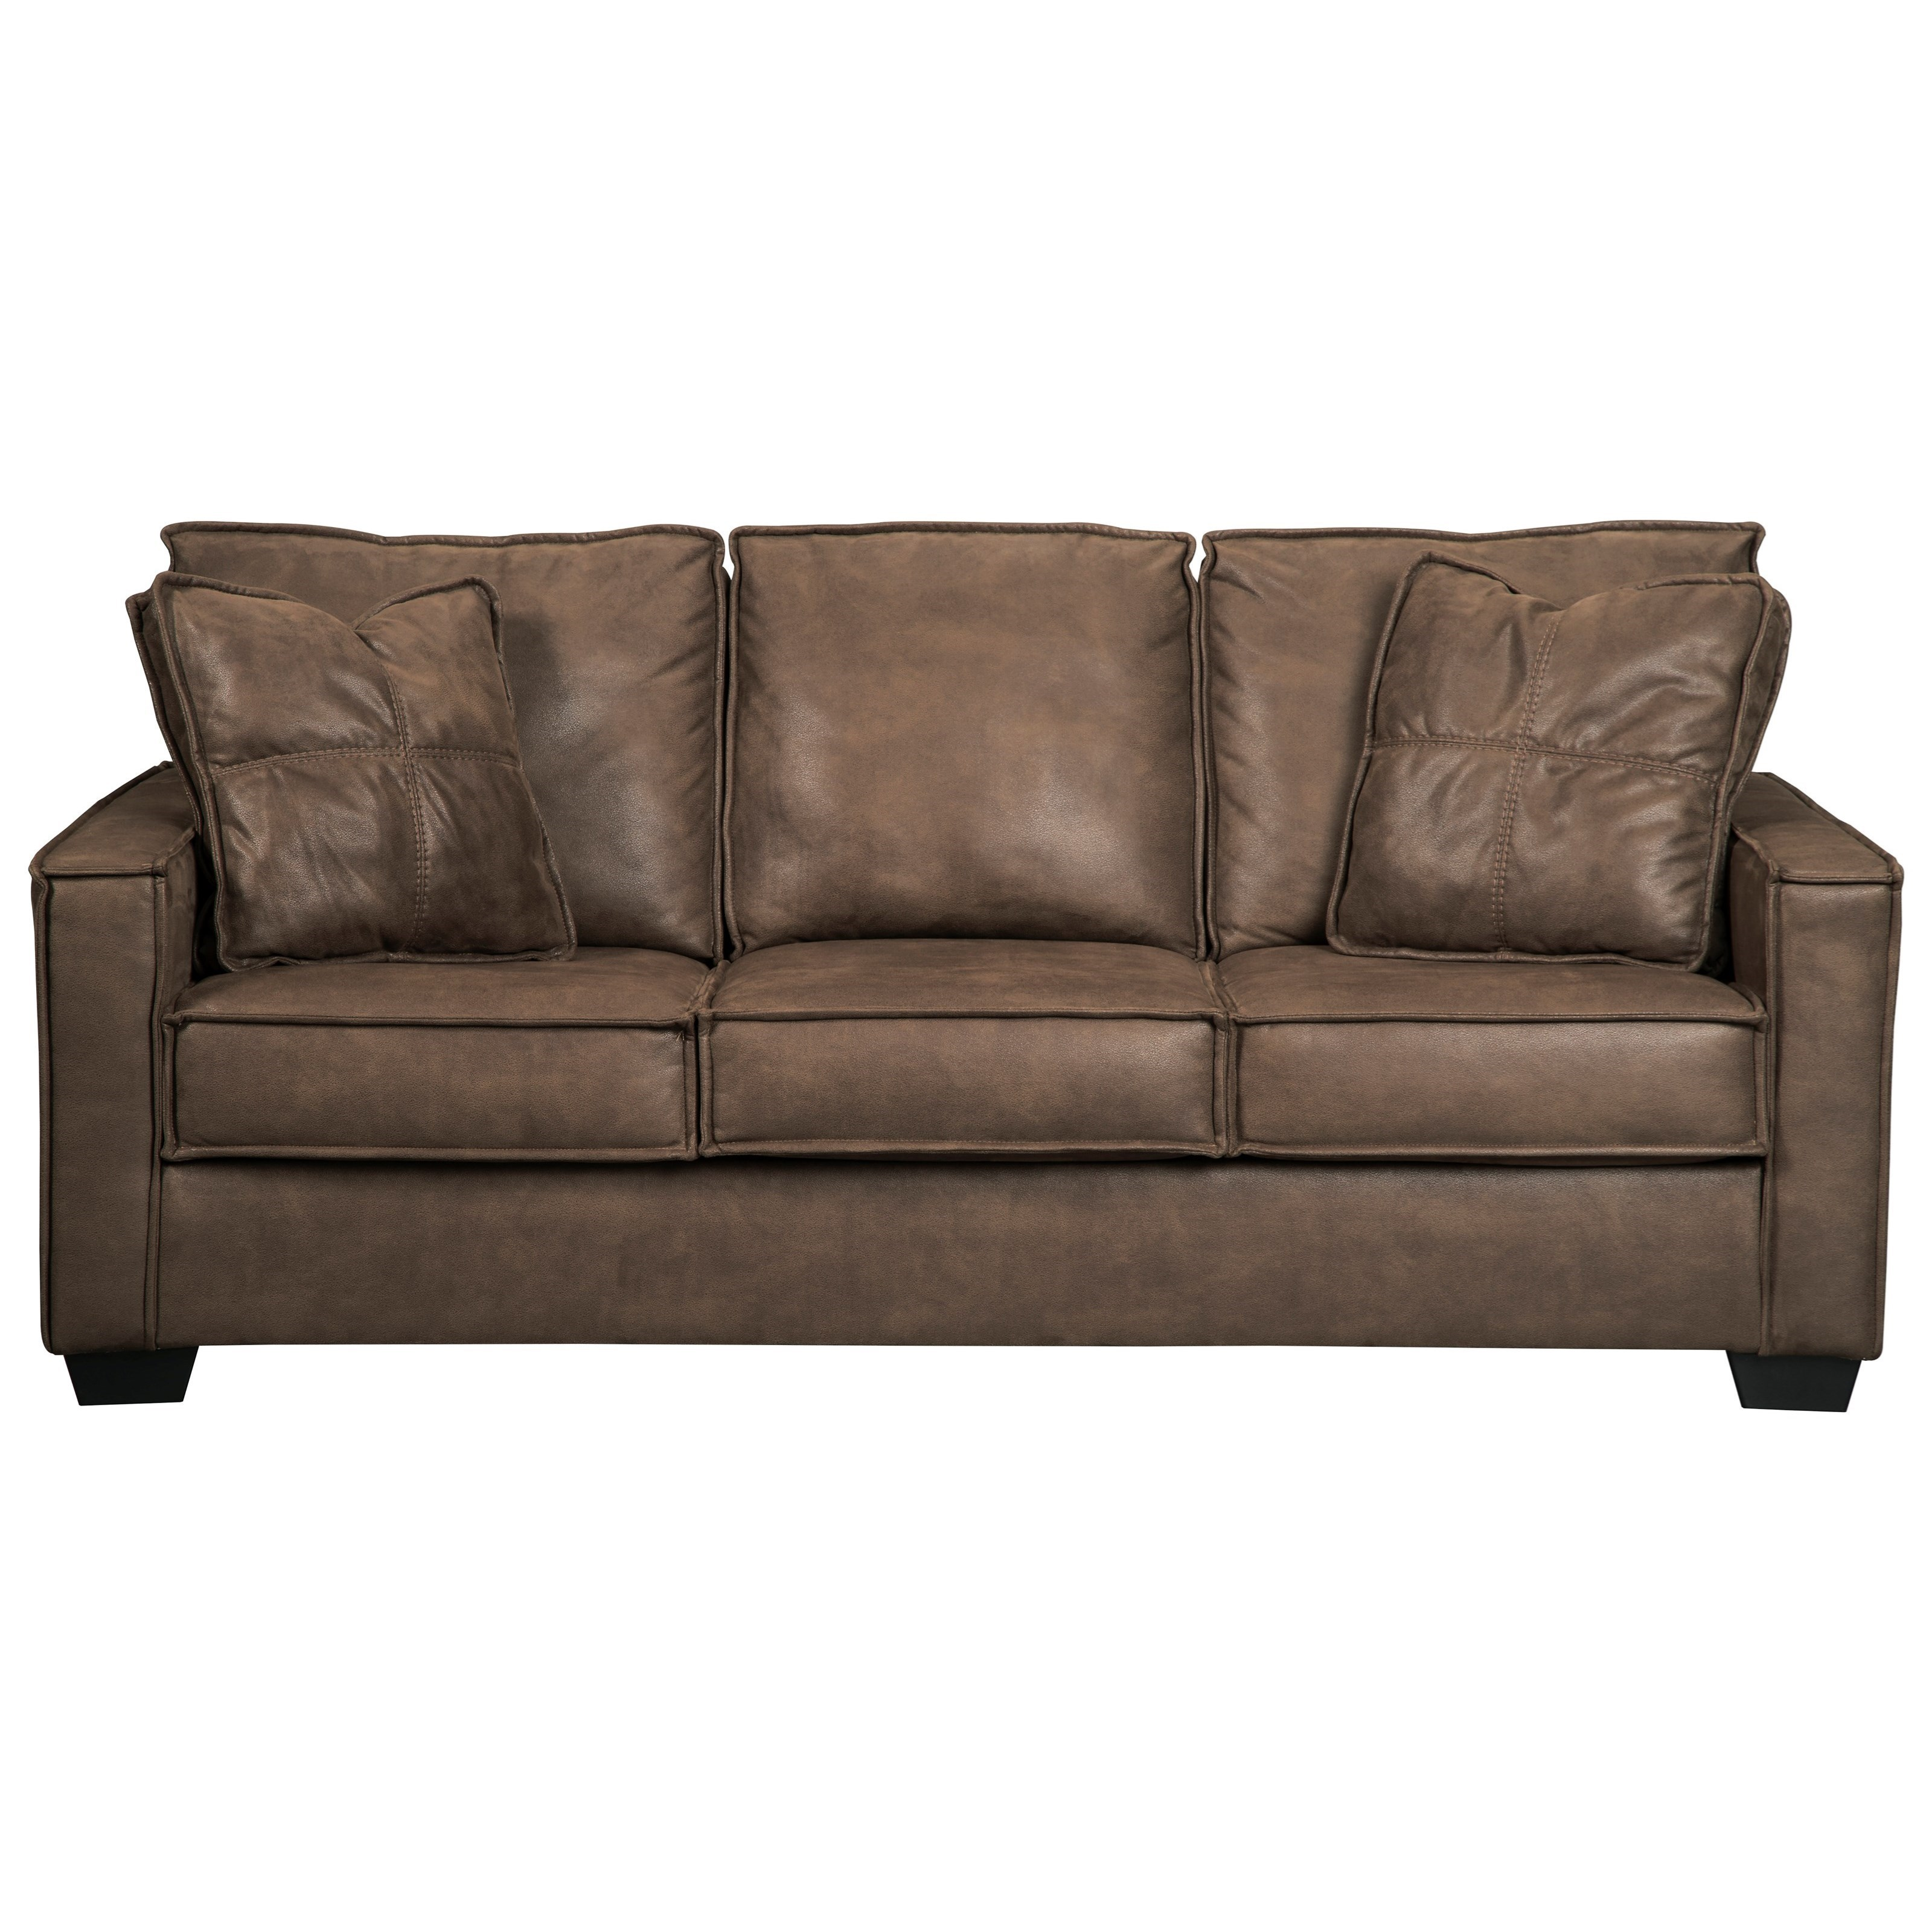 Signature Design By Ashley Terrington Faux Leather Sofa With Piecrust Welt  Trim